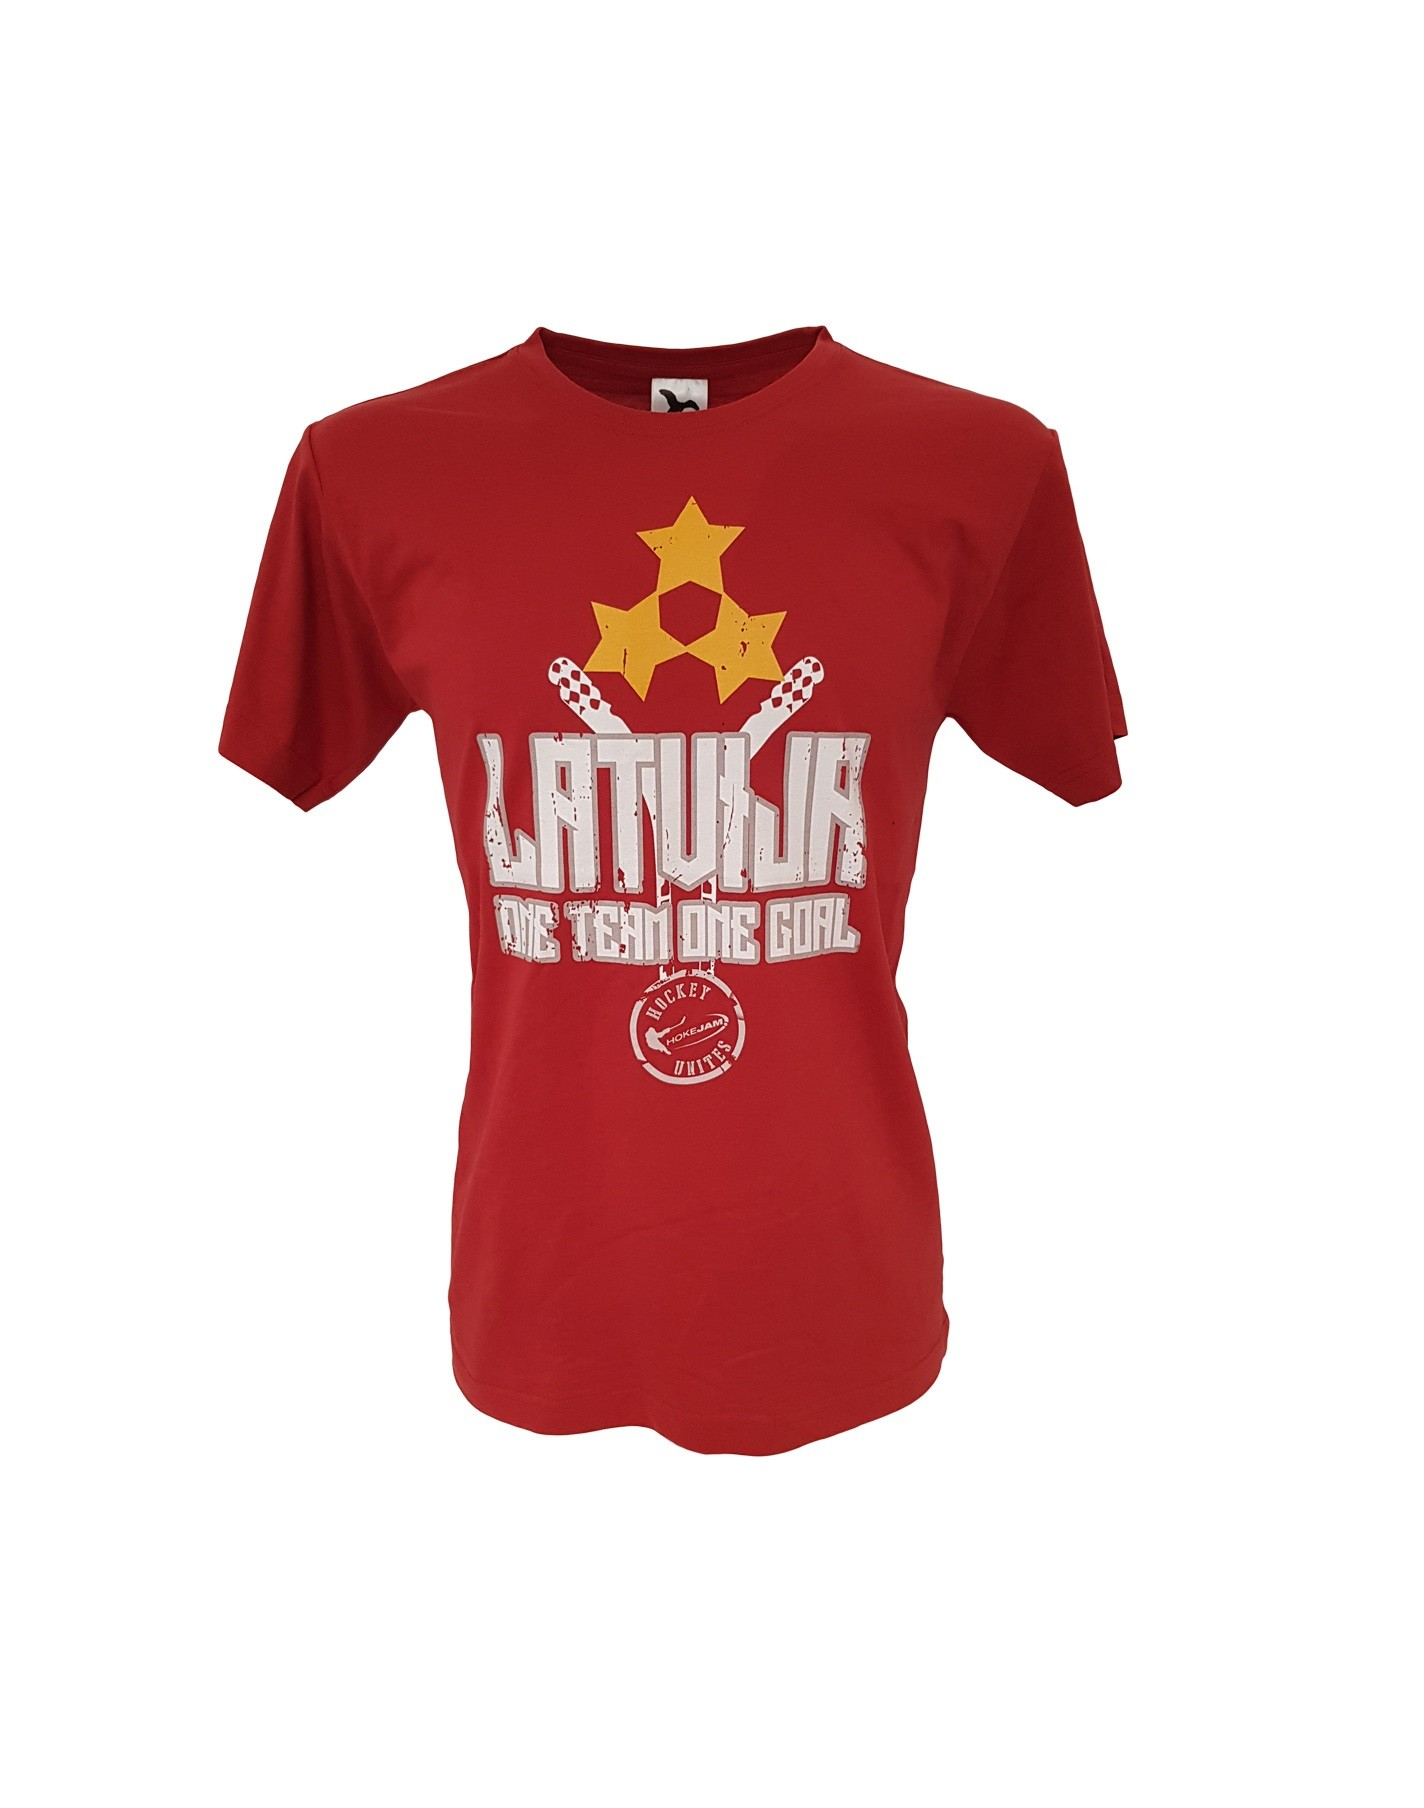 HOKEJAM.LV Latvija One Team One Goal Bērnu T-Krekls